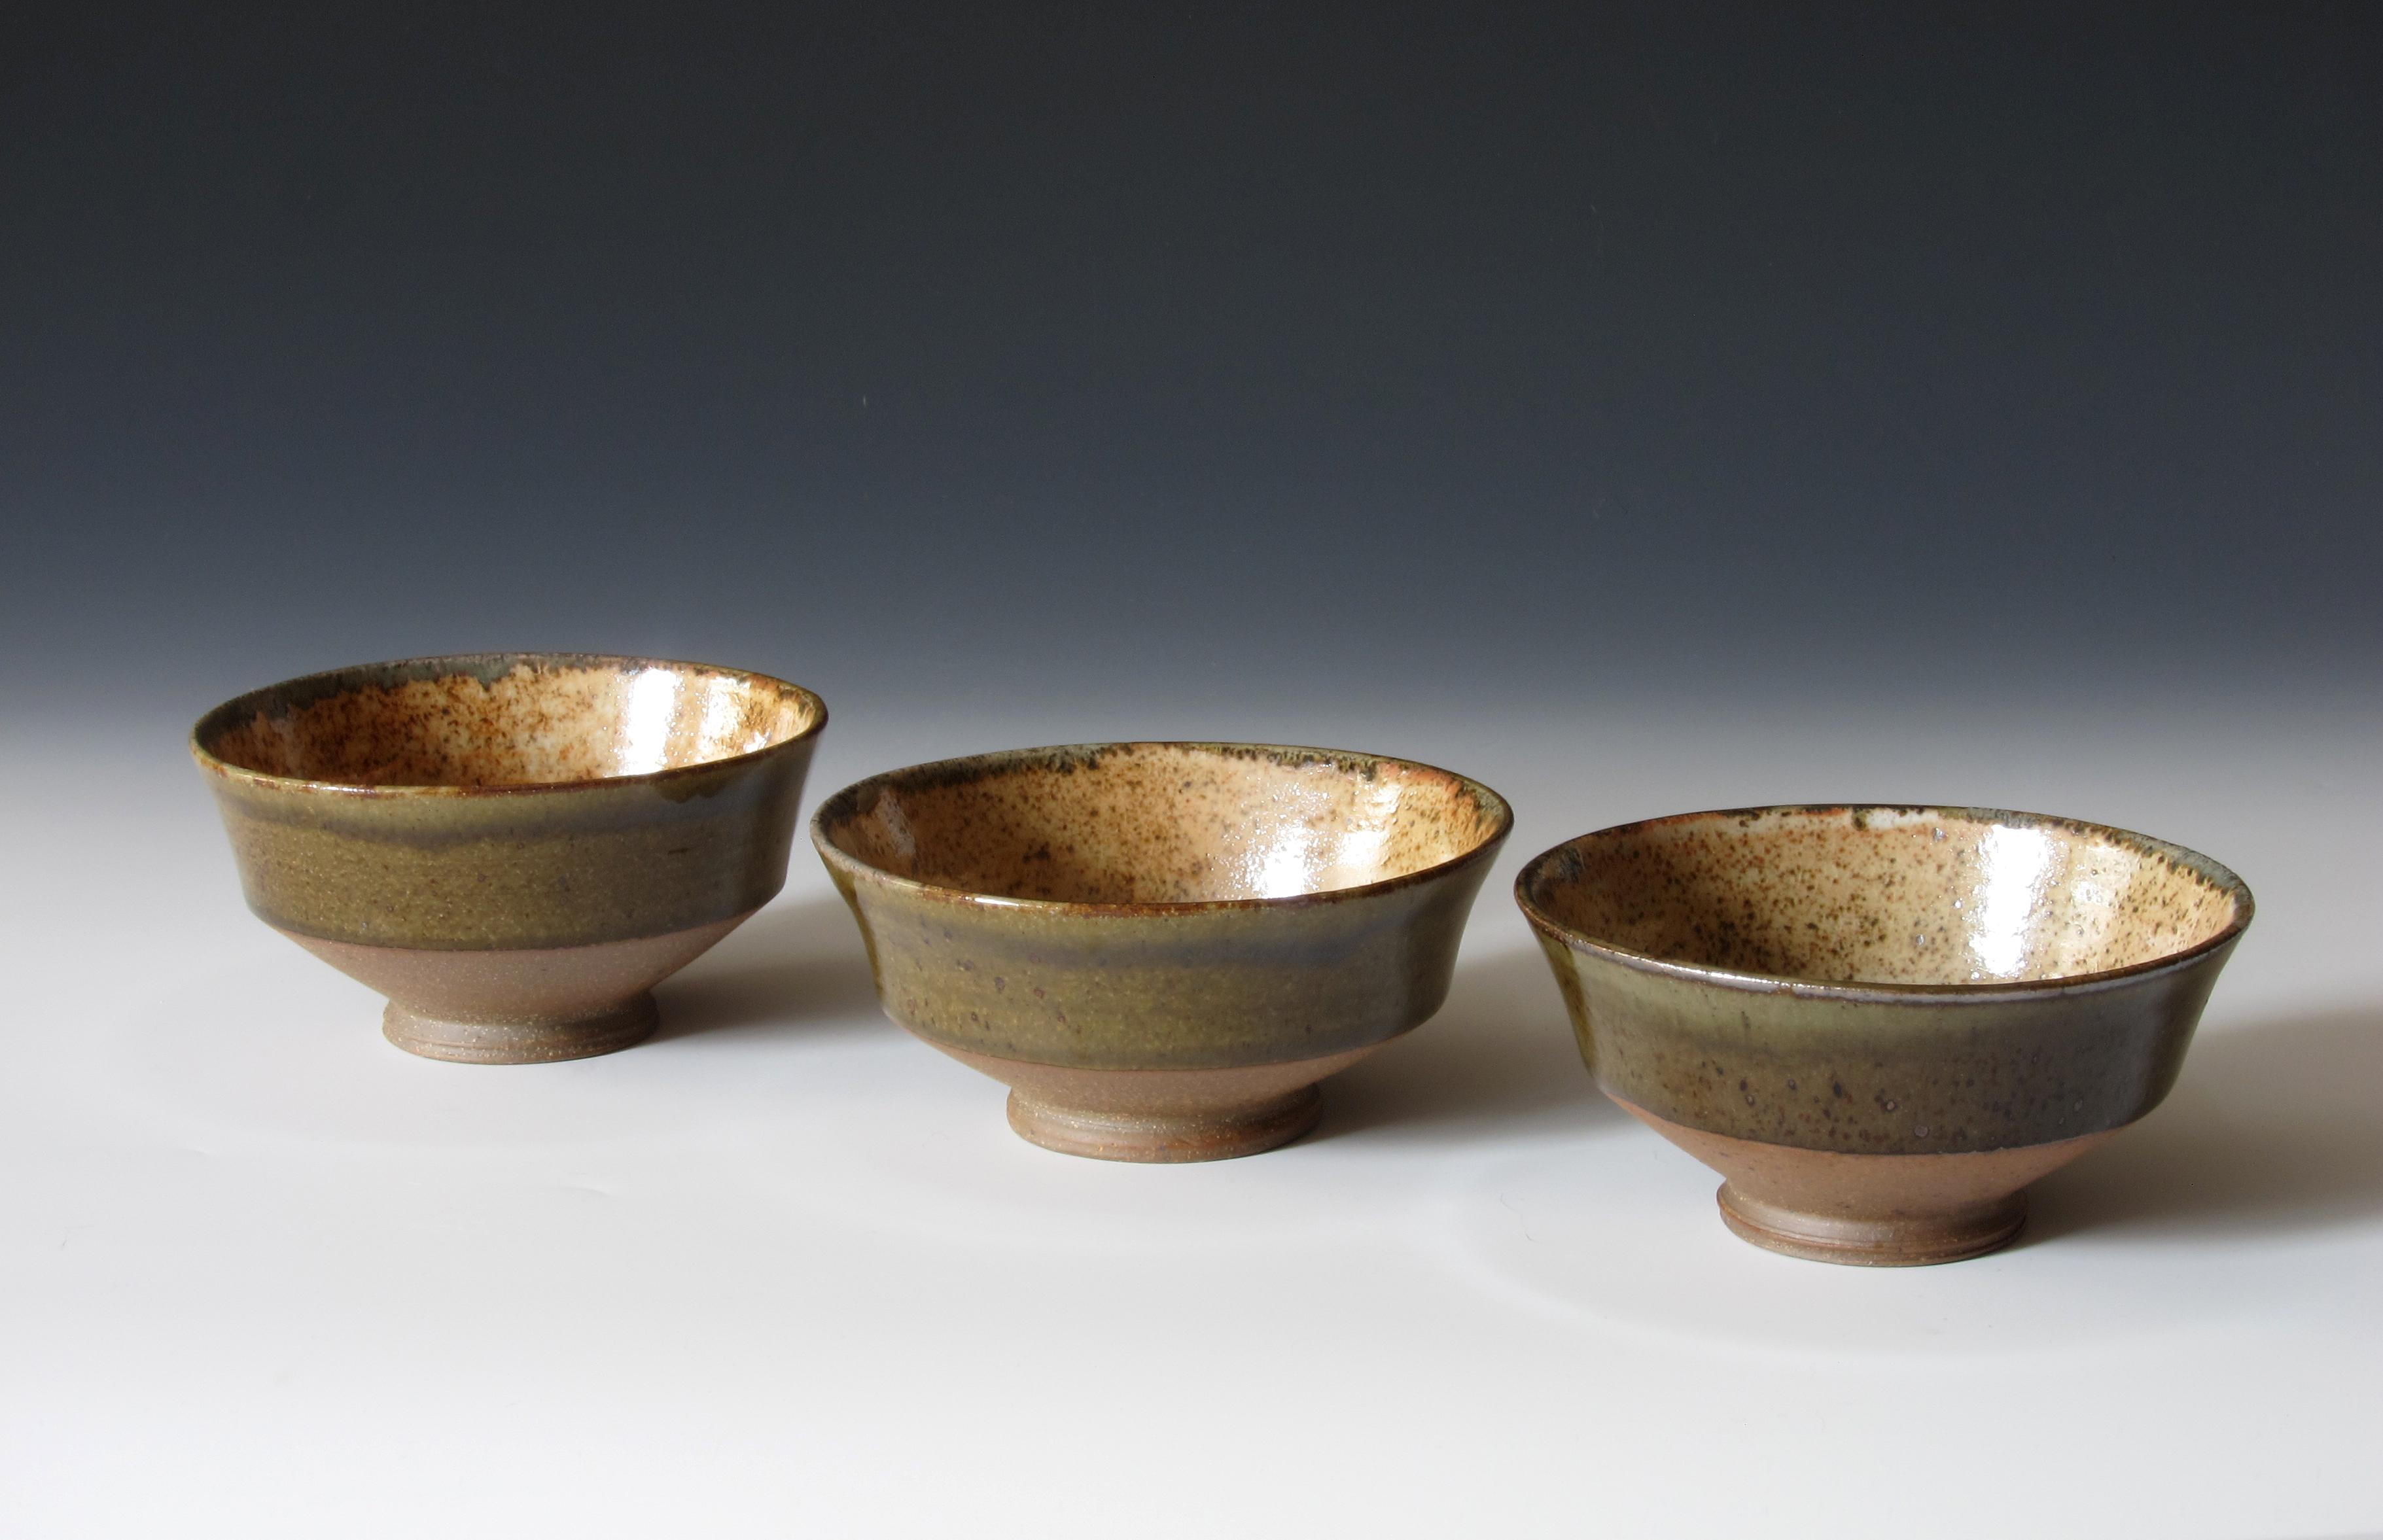 Aali Bowls